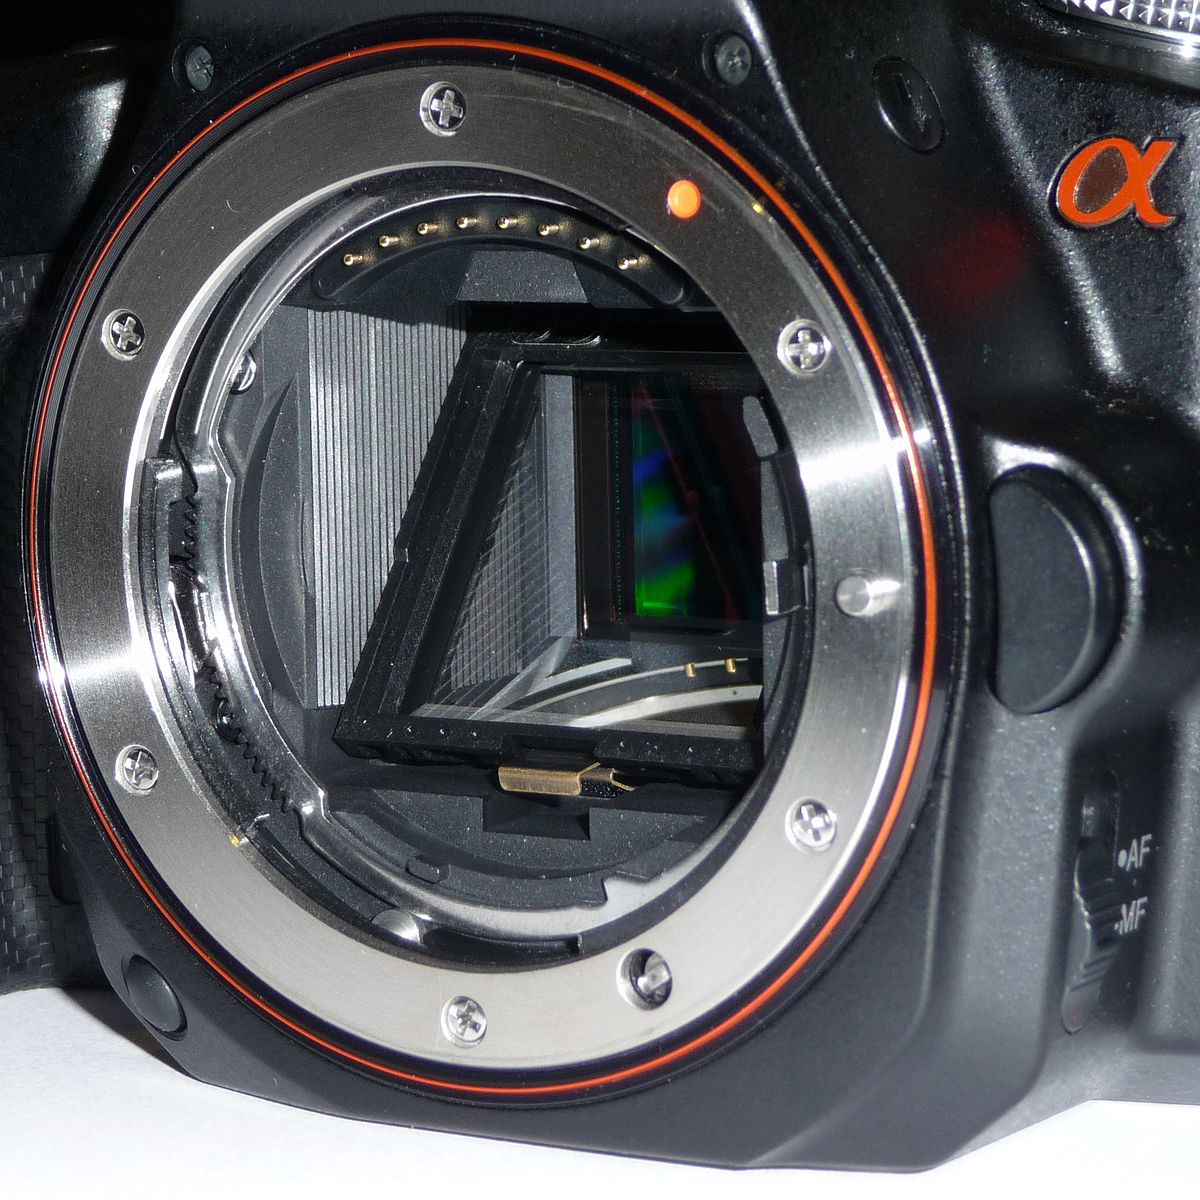 Camera Slt Camera Vs Dslr sony slt camera wikipedia